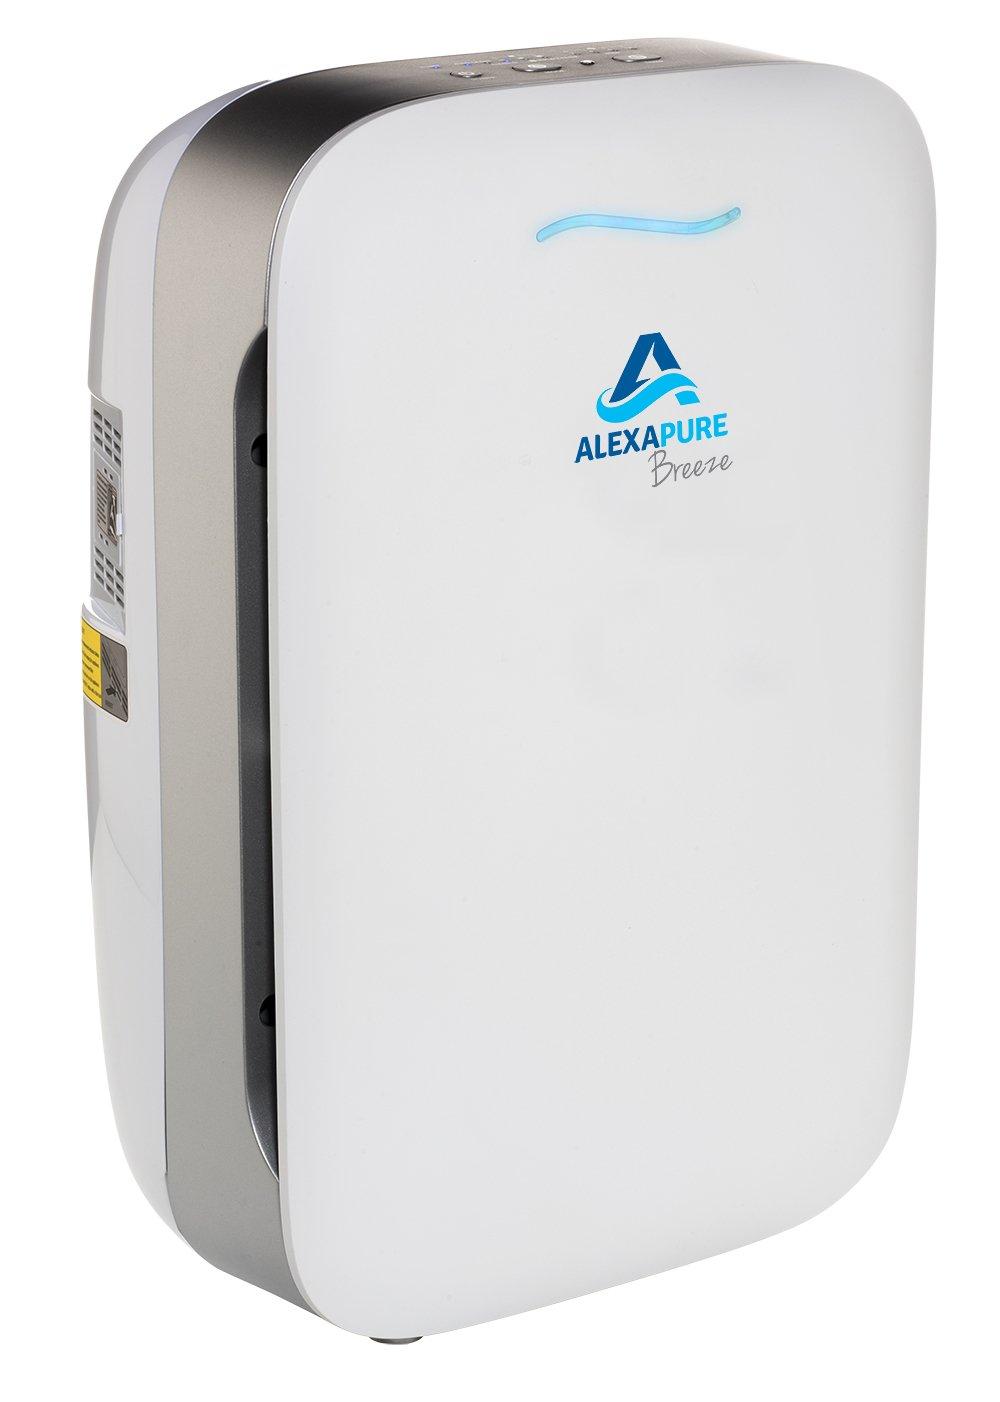 Alexa pure air purification system